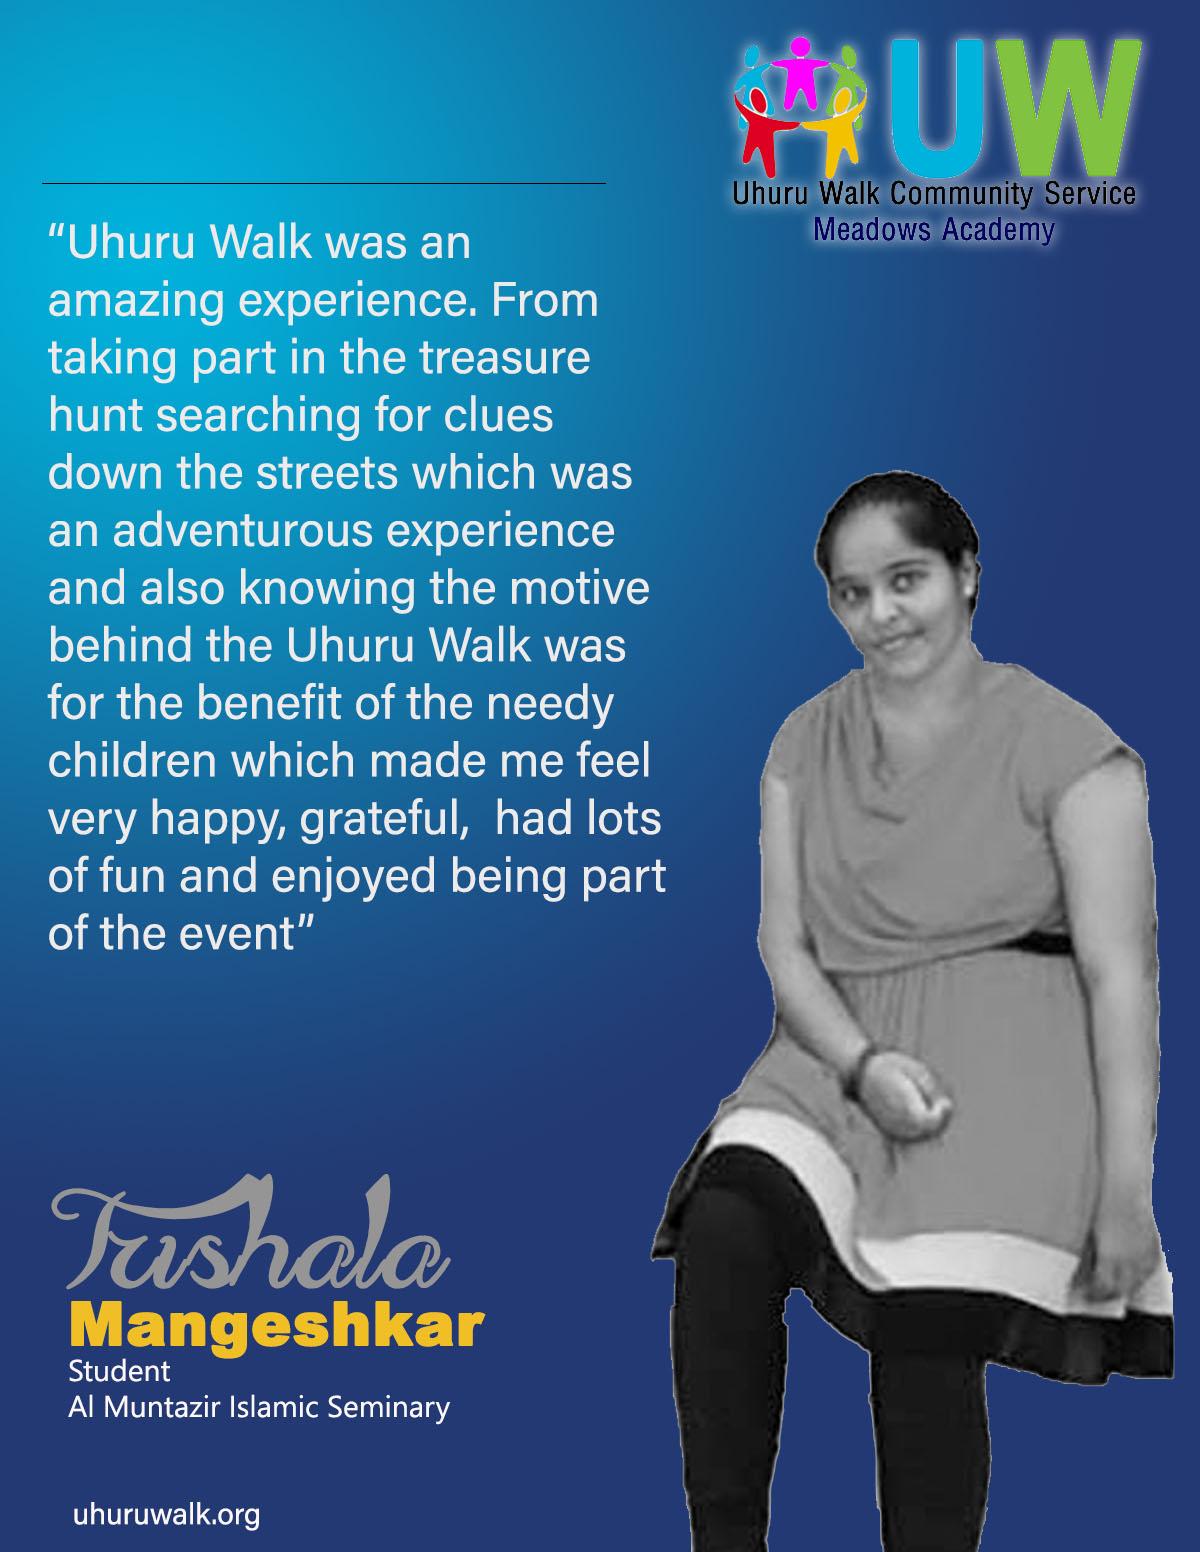 Meadows-Academy-Uhuru-Walk-Trishala-Mangeshkar-Uhuru-Walk-New-Testimonial